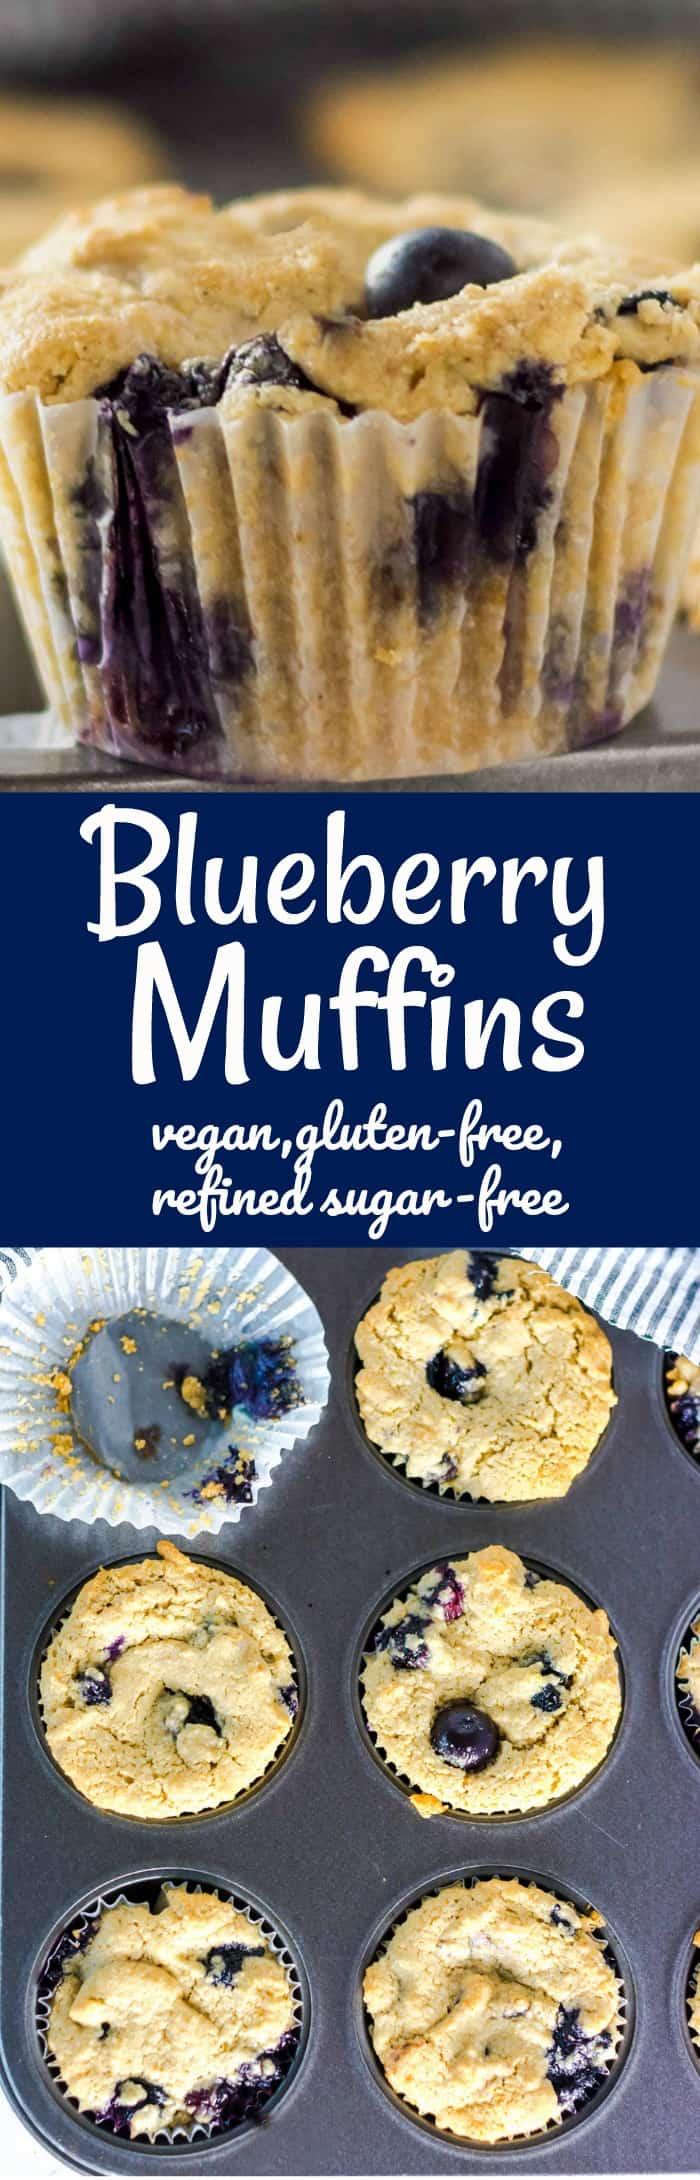 Blueberry Muffins Vegan Gluten-Free, Refined-Sugarfree